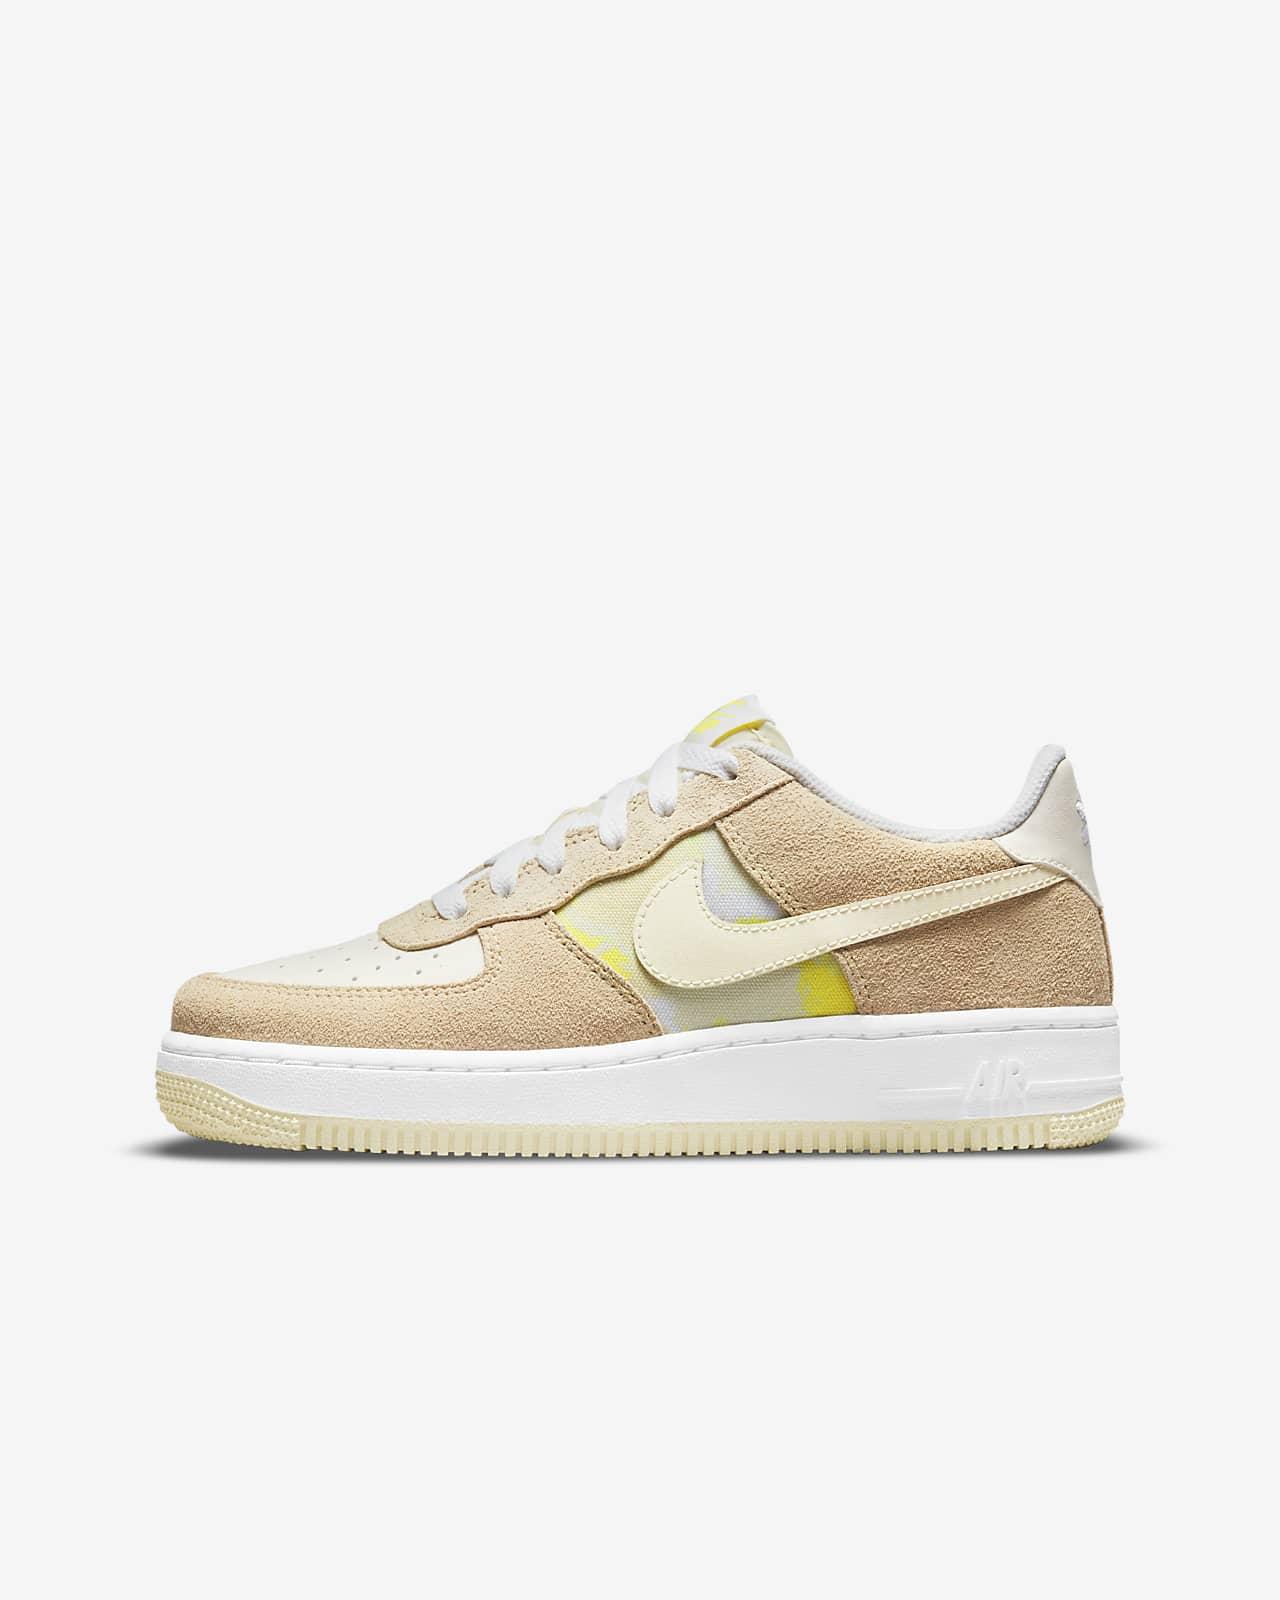 Nike Air Force 1 Low GS 大童运动童鞋